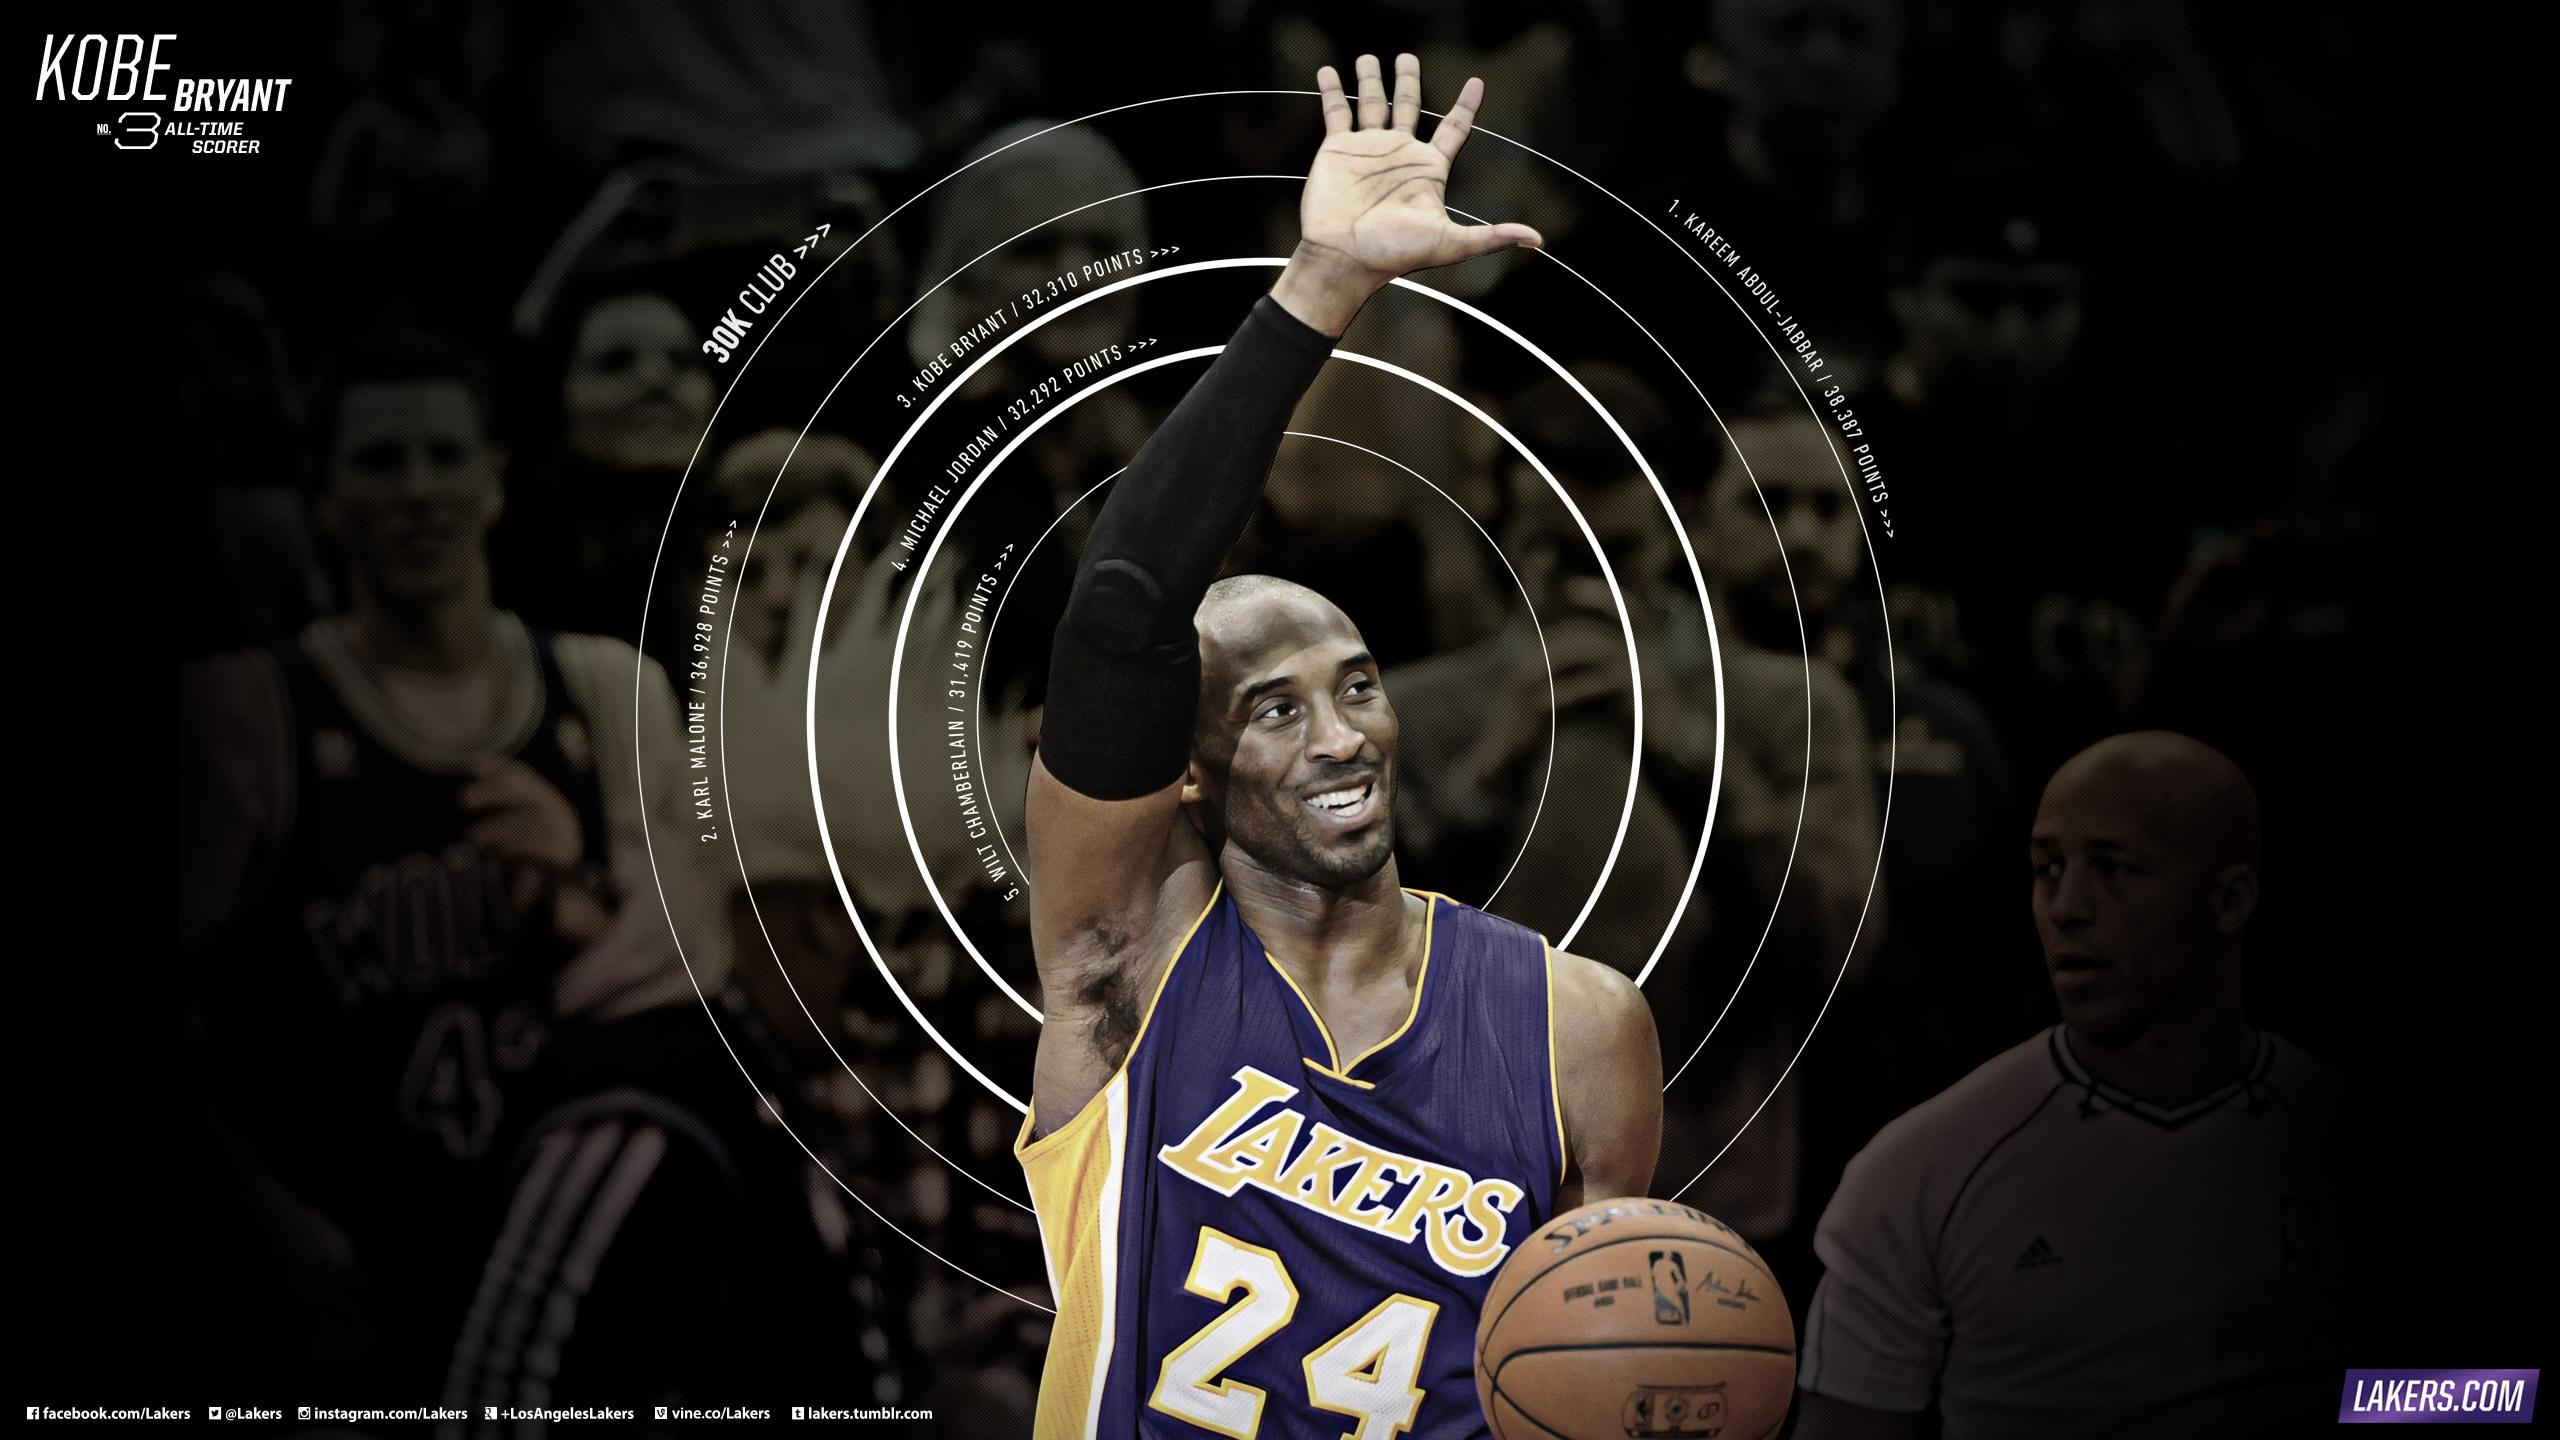 Kobe Bryant High Definition